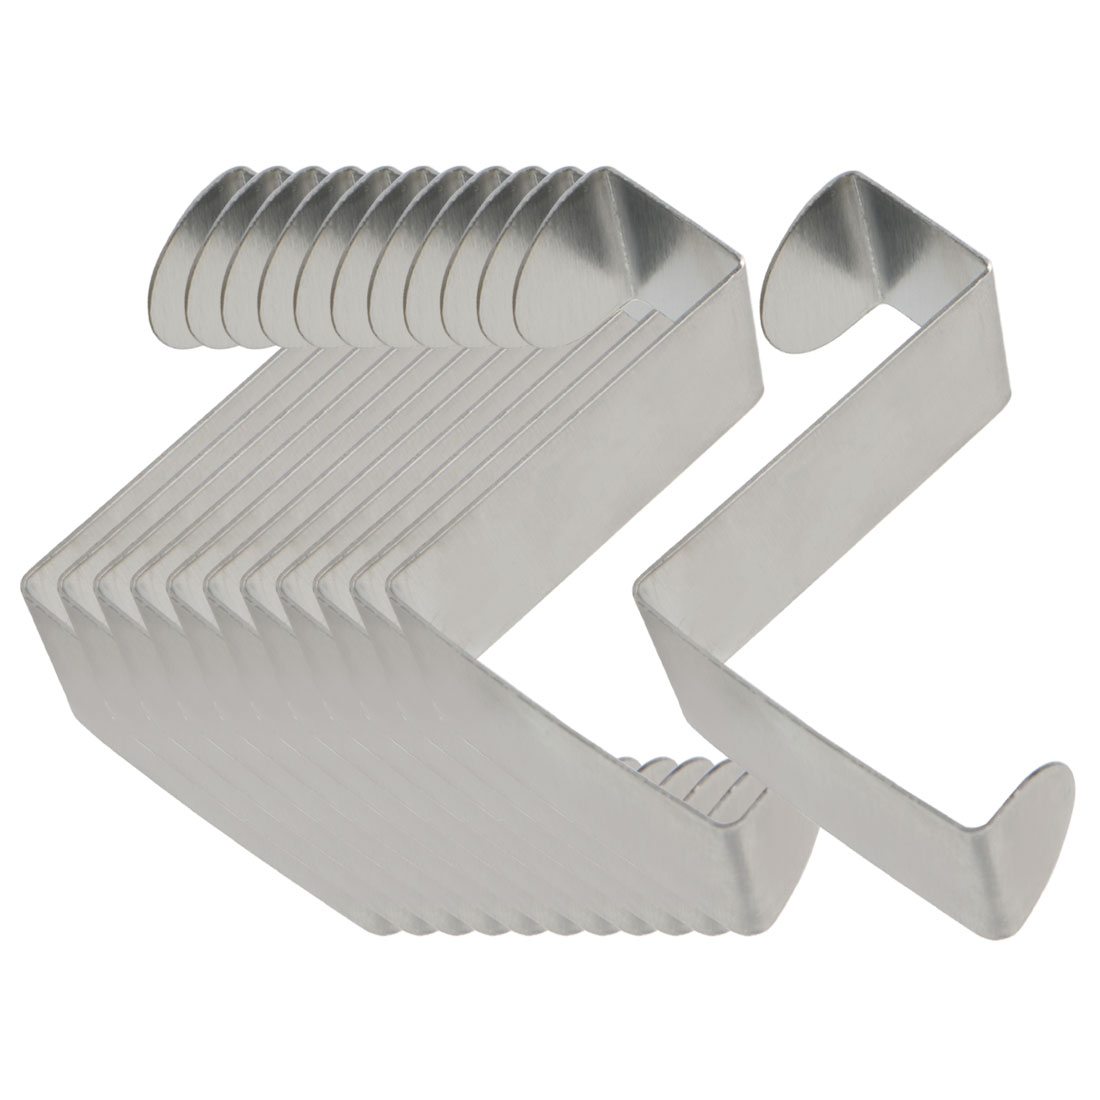 12pcs Z Shaped Hook Stainless Steel for Kitchenware Pot Utensils Coat Holders